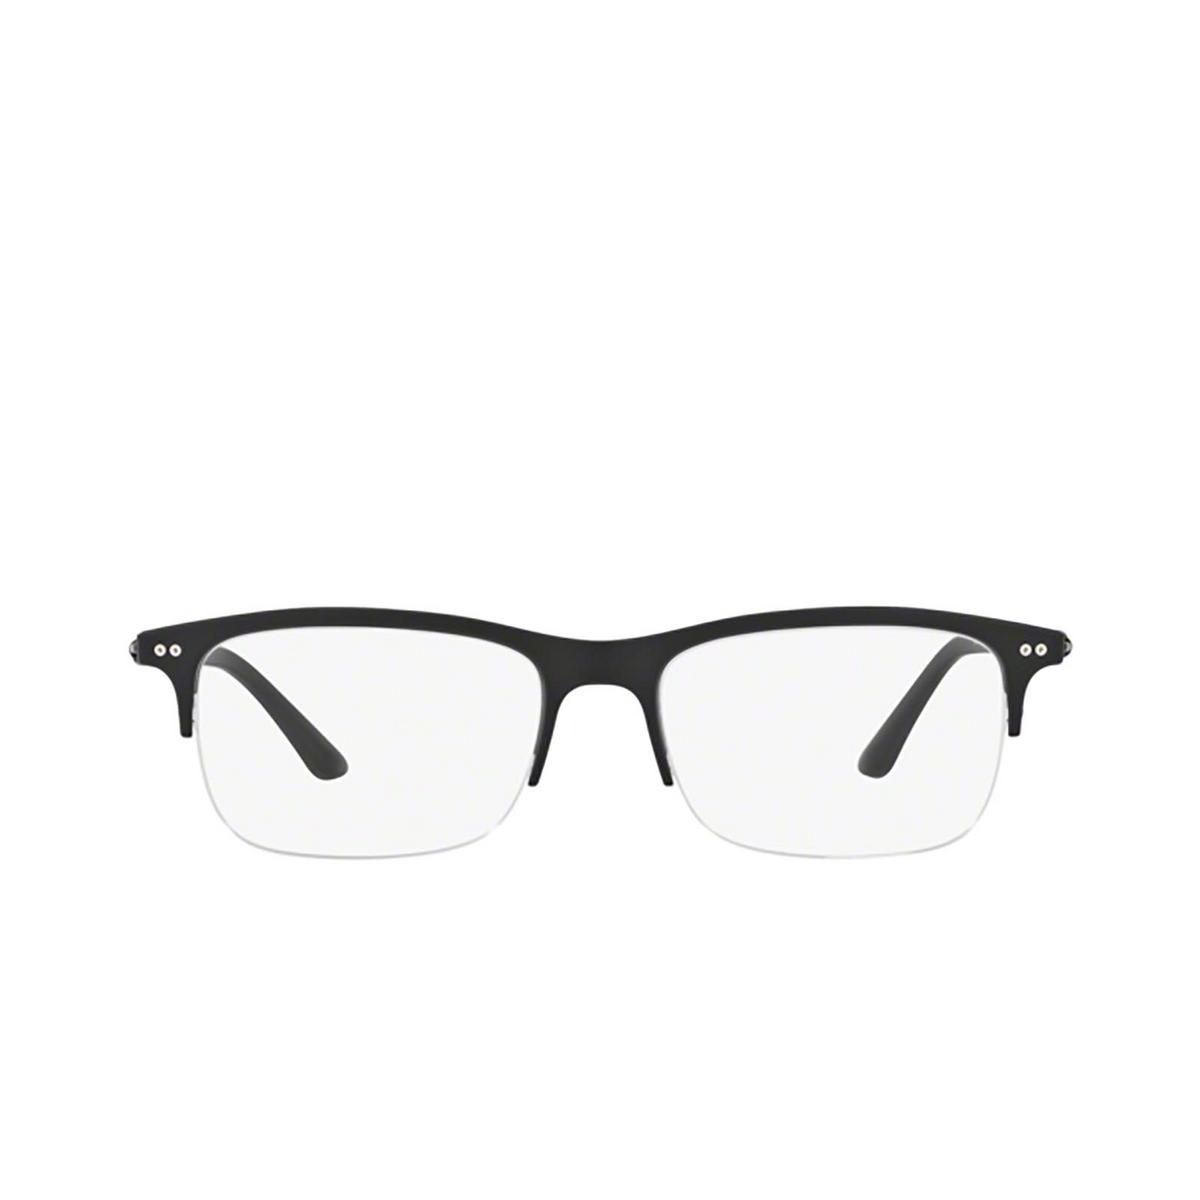 Giorgio Armani® Rectangle Eyeglasses: AR7113 color 5042 - front view.